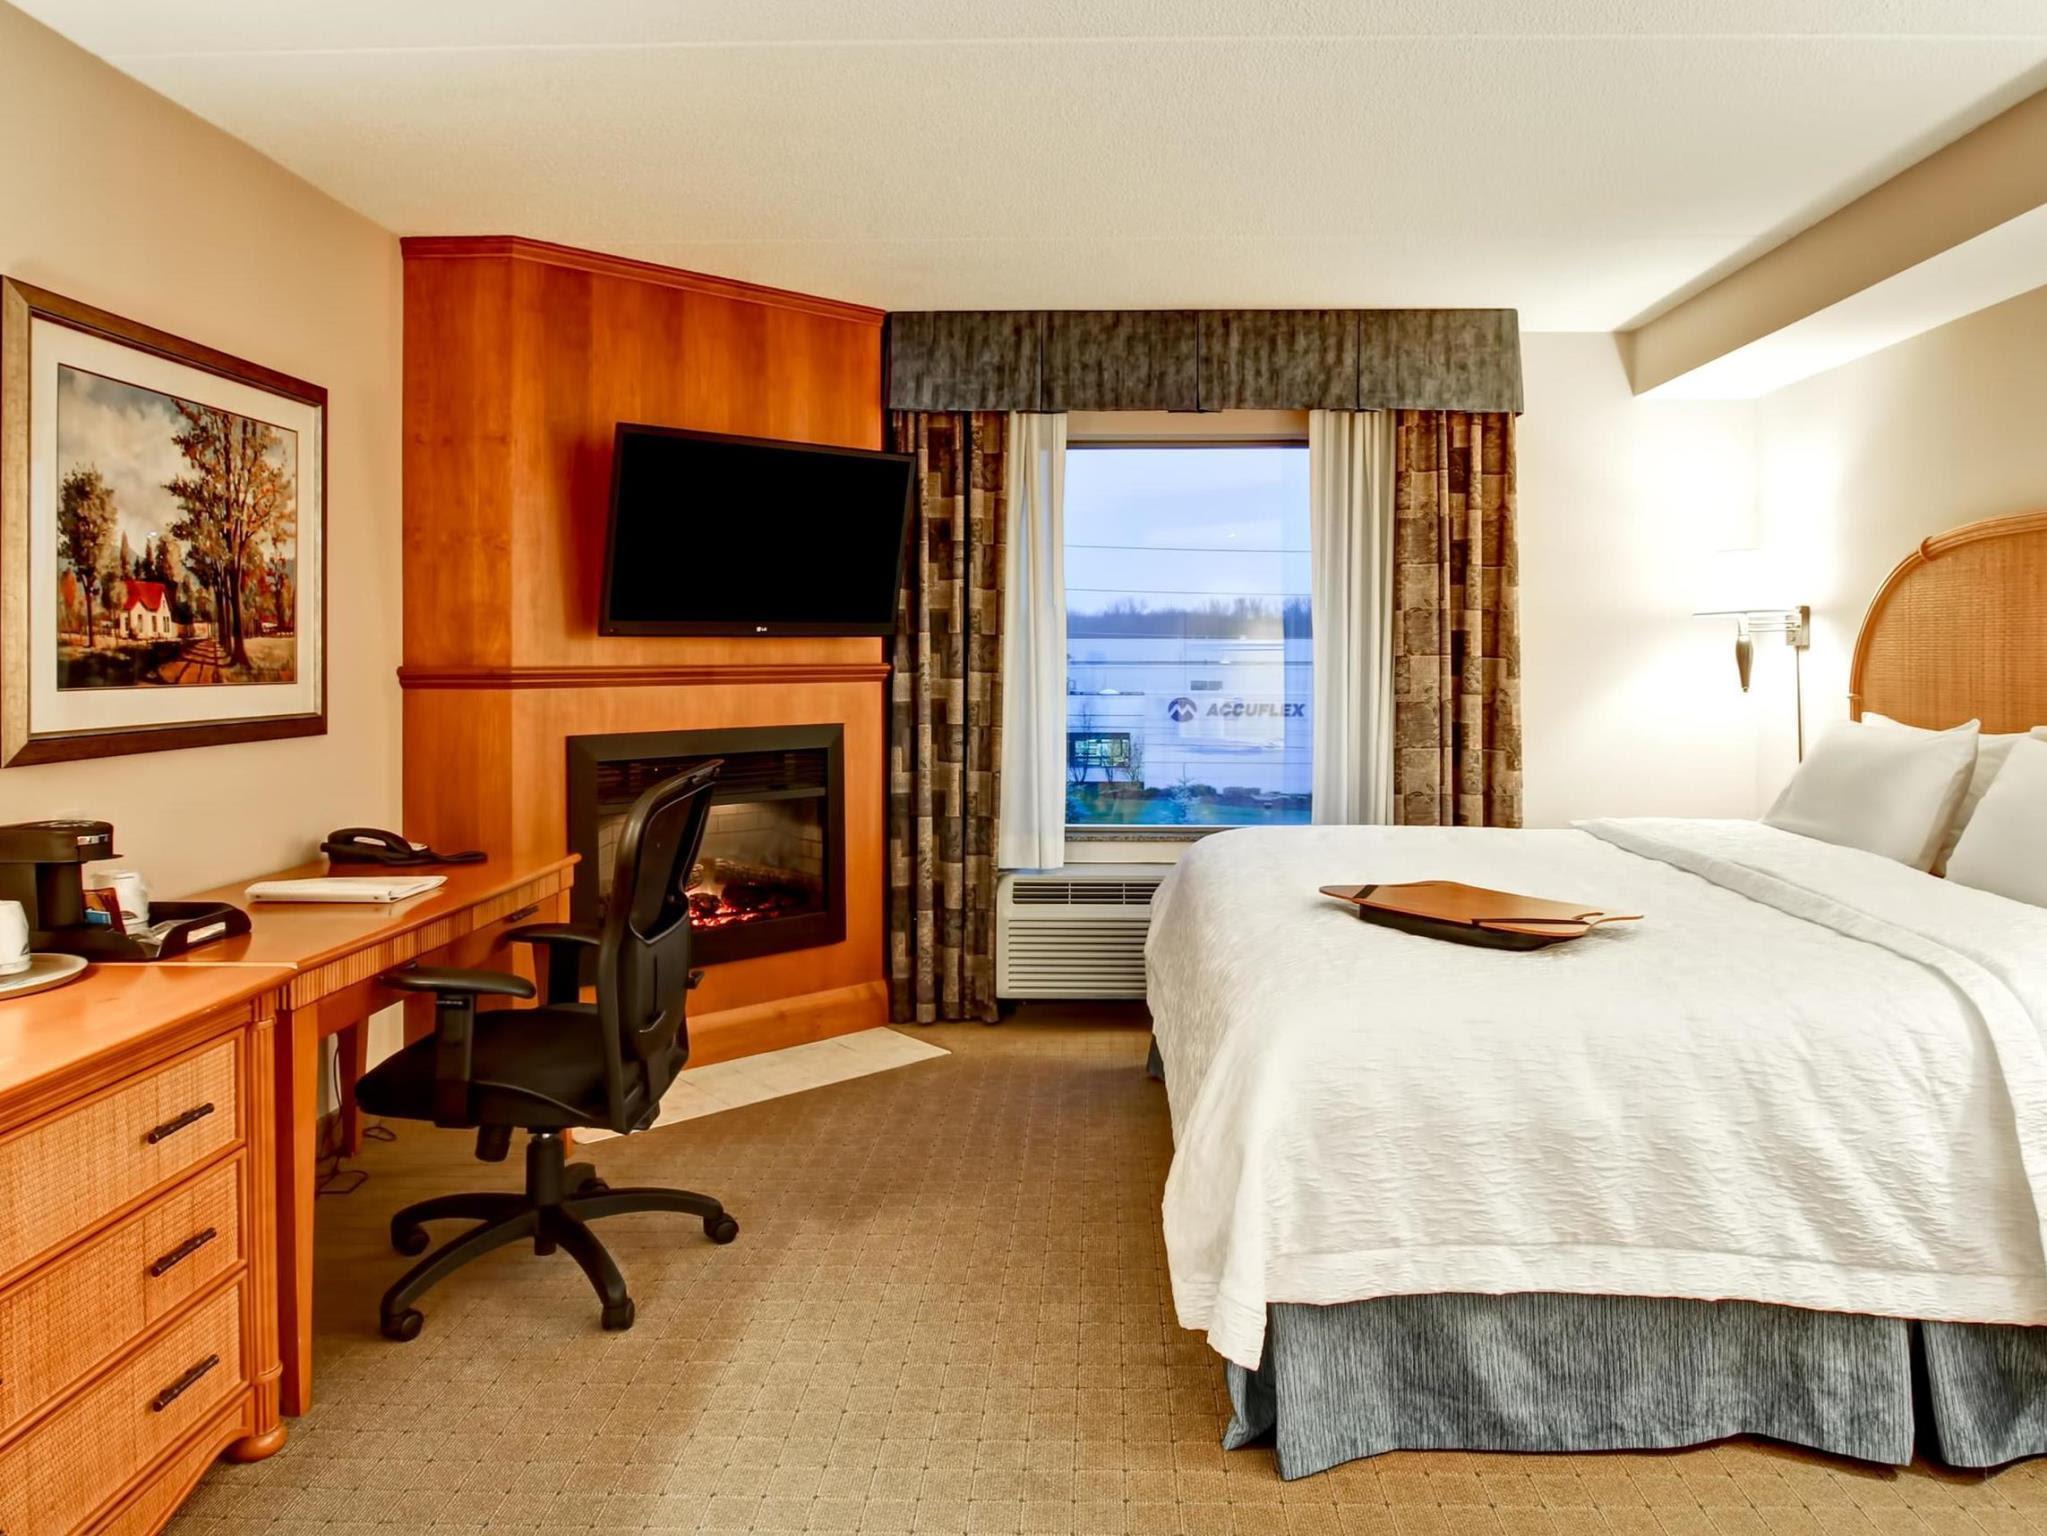 Hampton Inn and Suites Guelph Ontario Discount